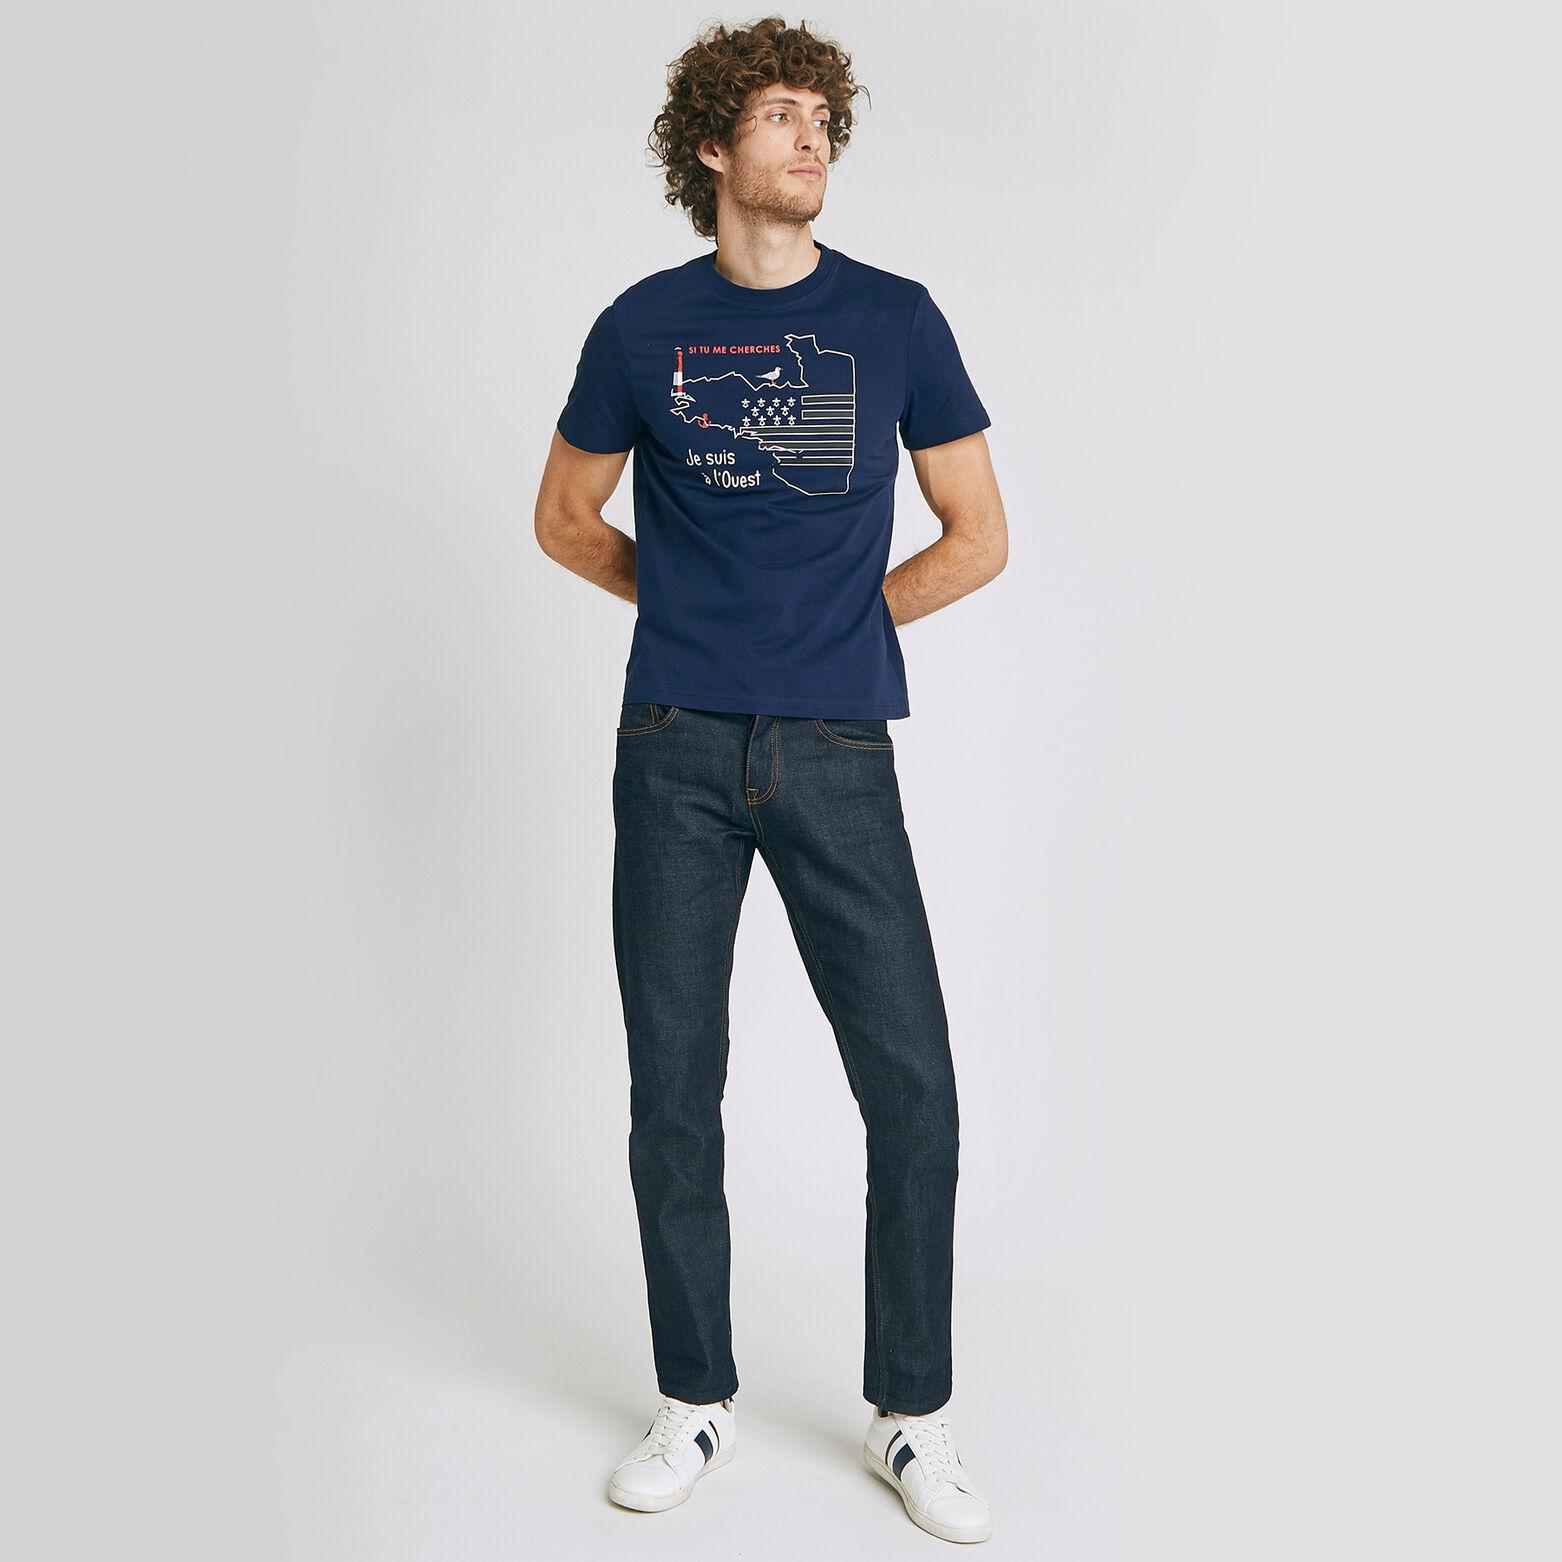 Tee-shirt imprimé région Bretagne